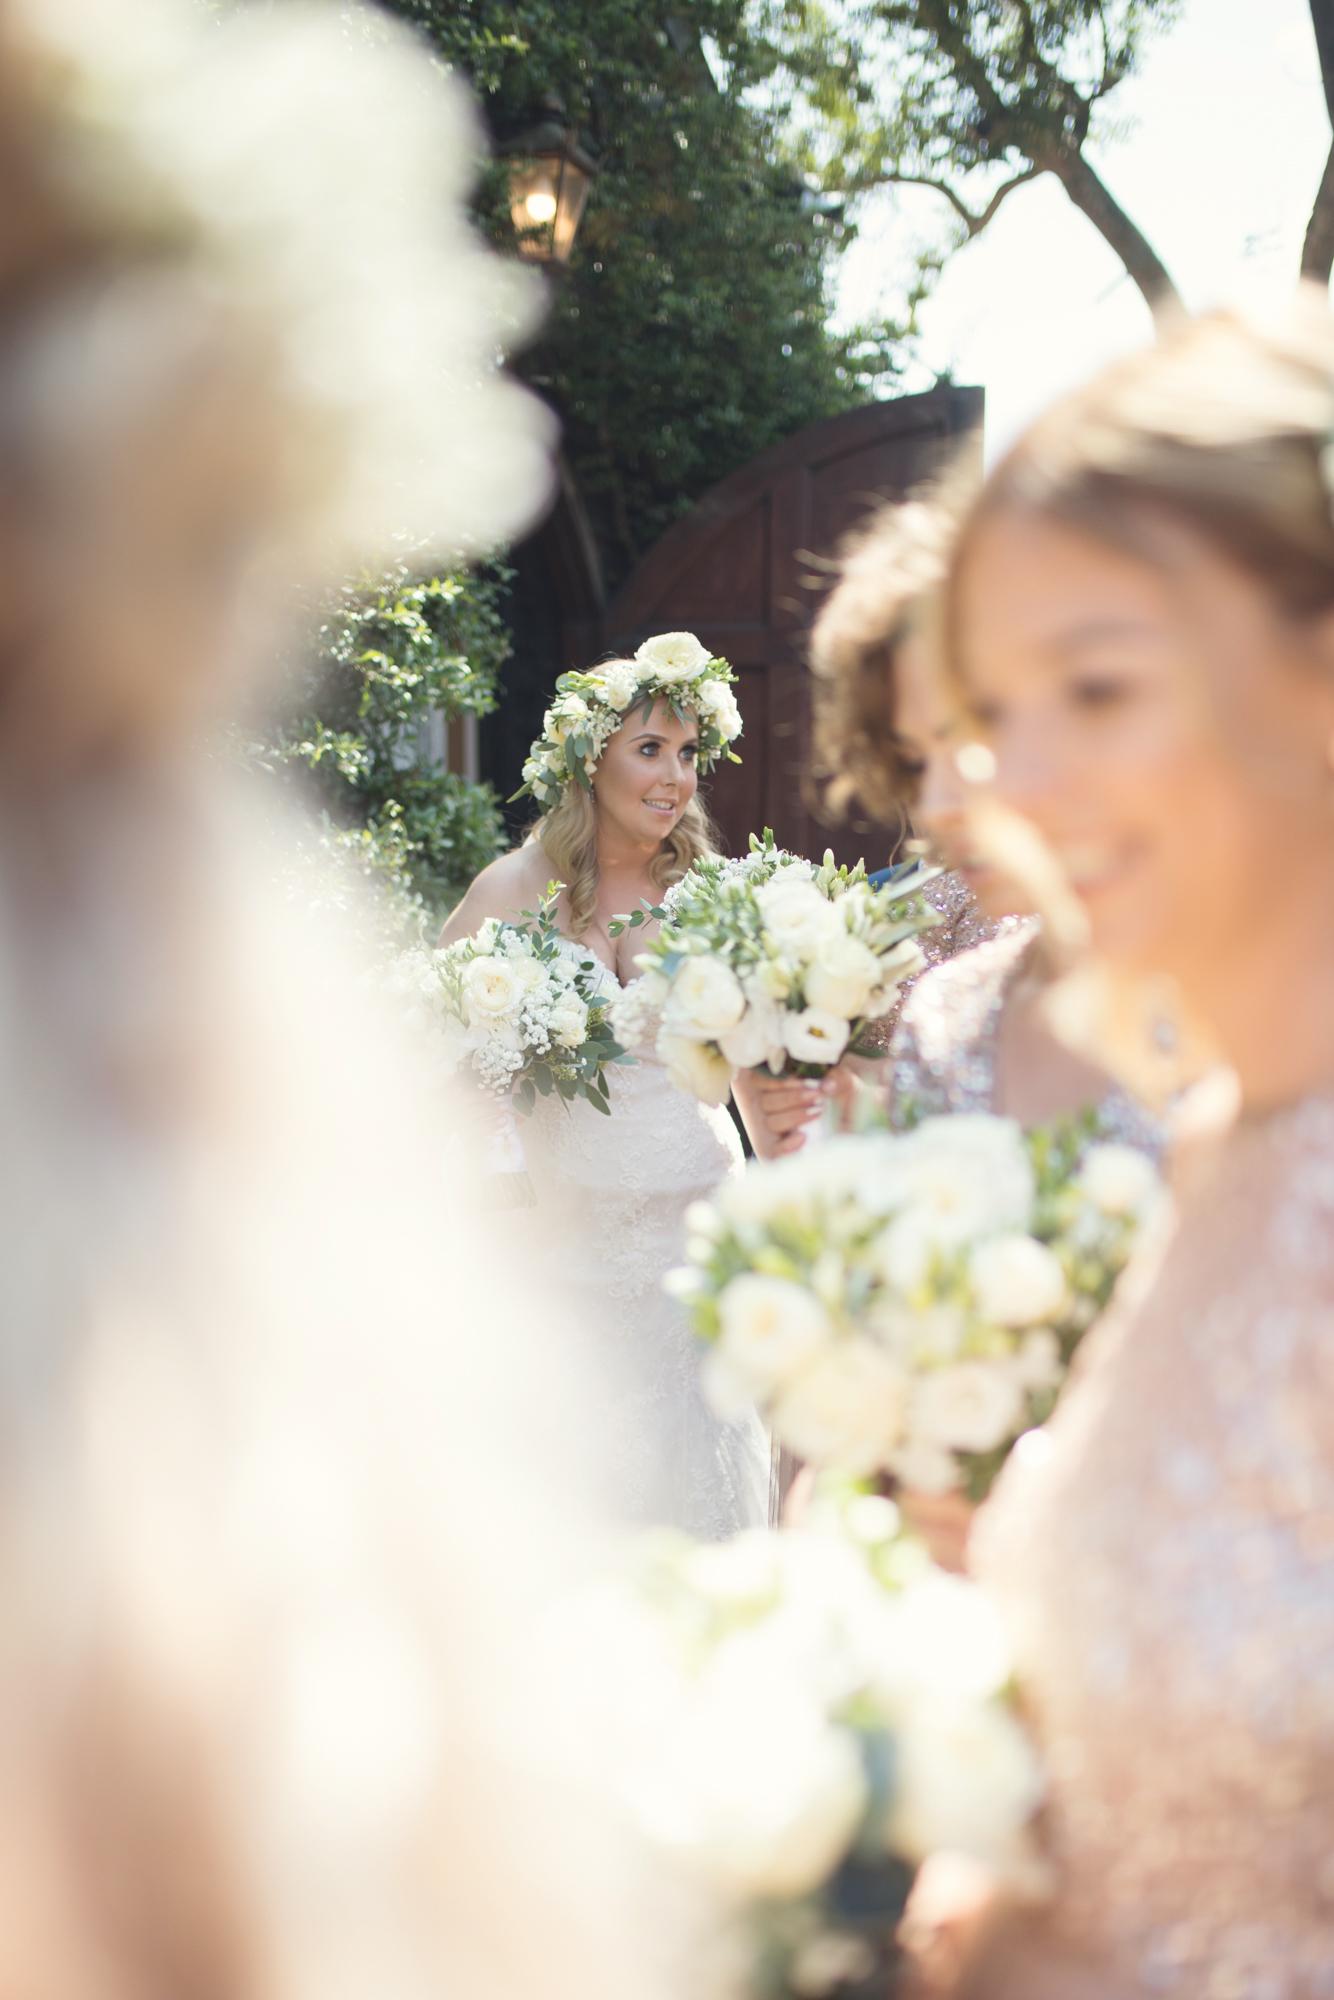 winters barns wedding photographer kent natural photography